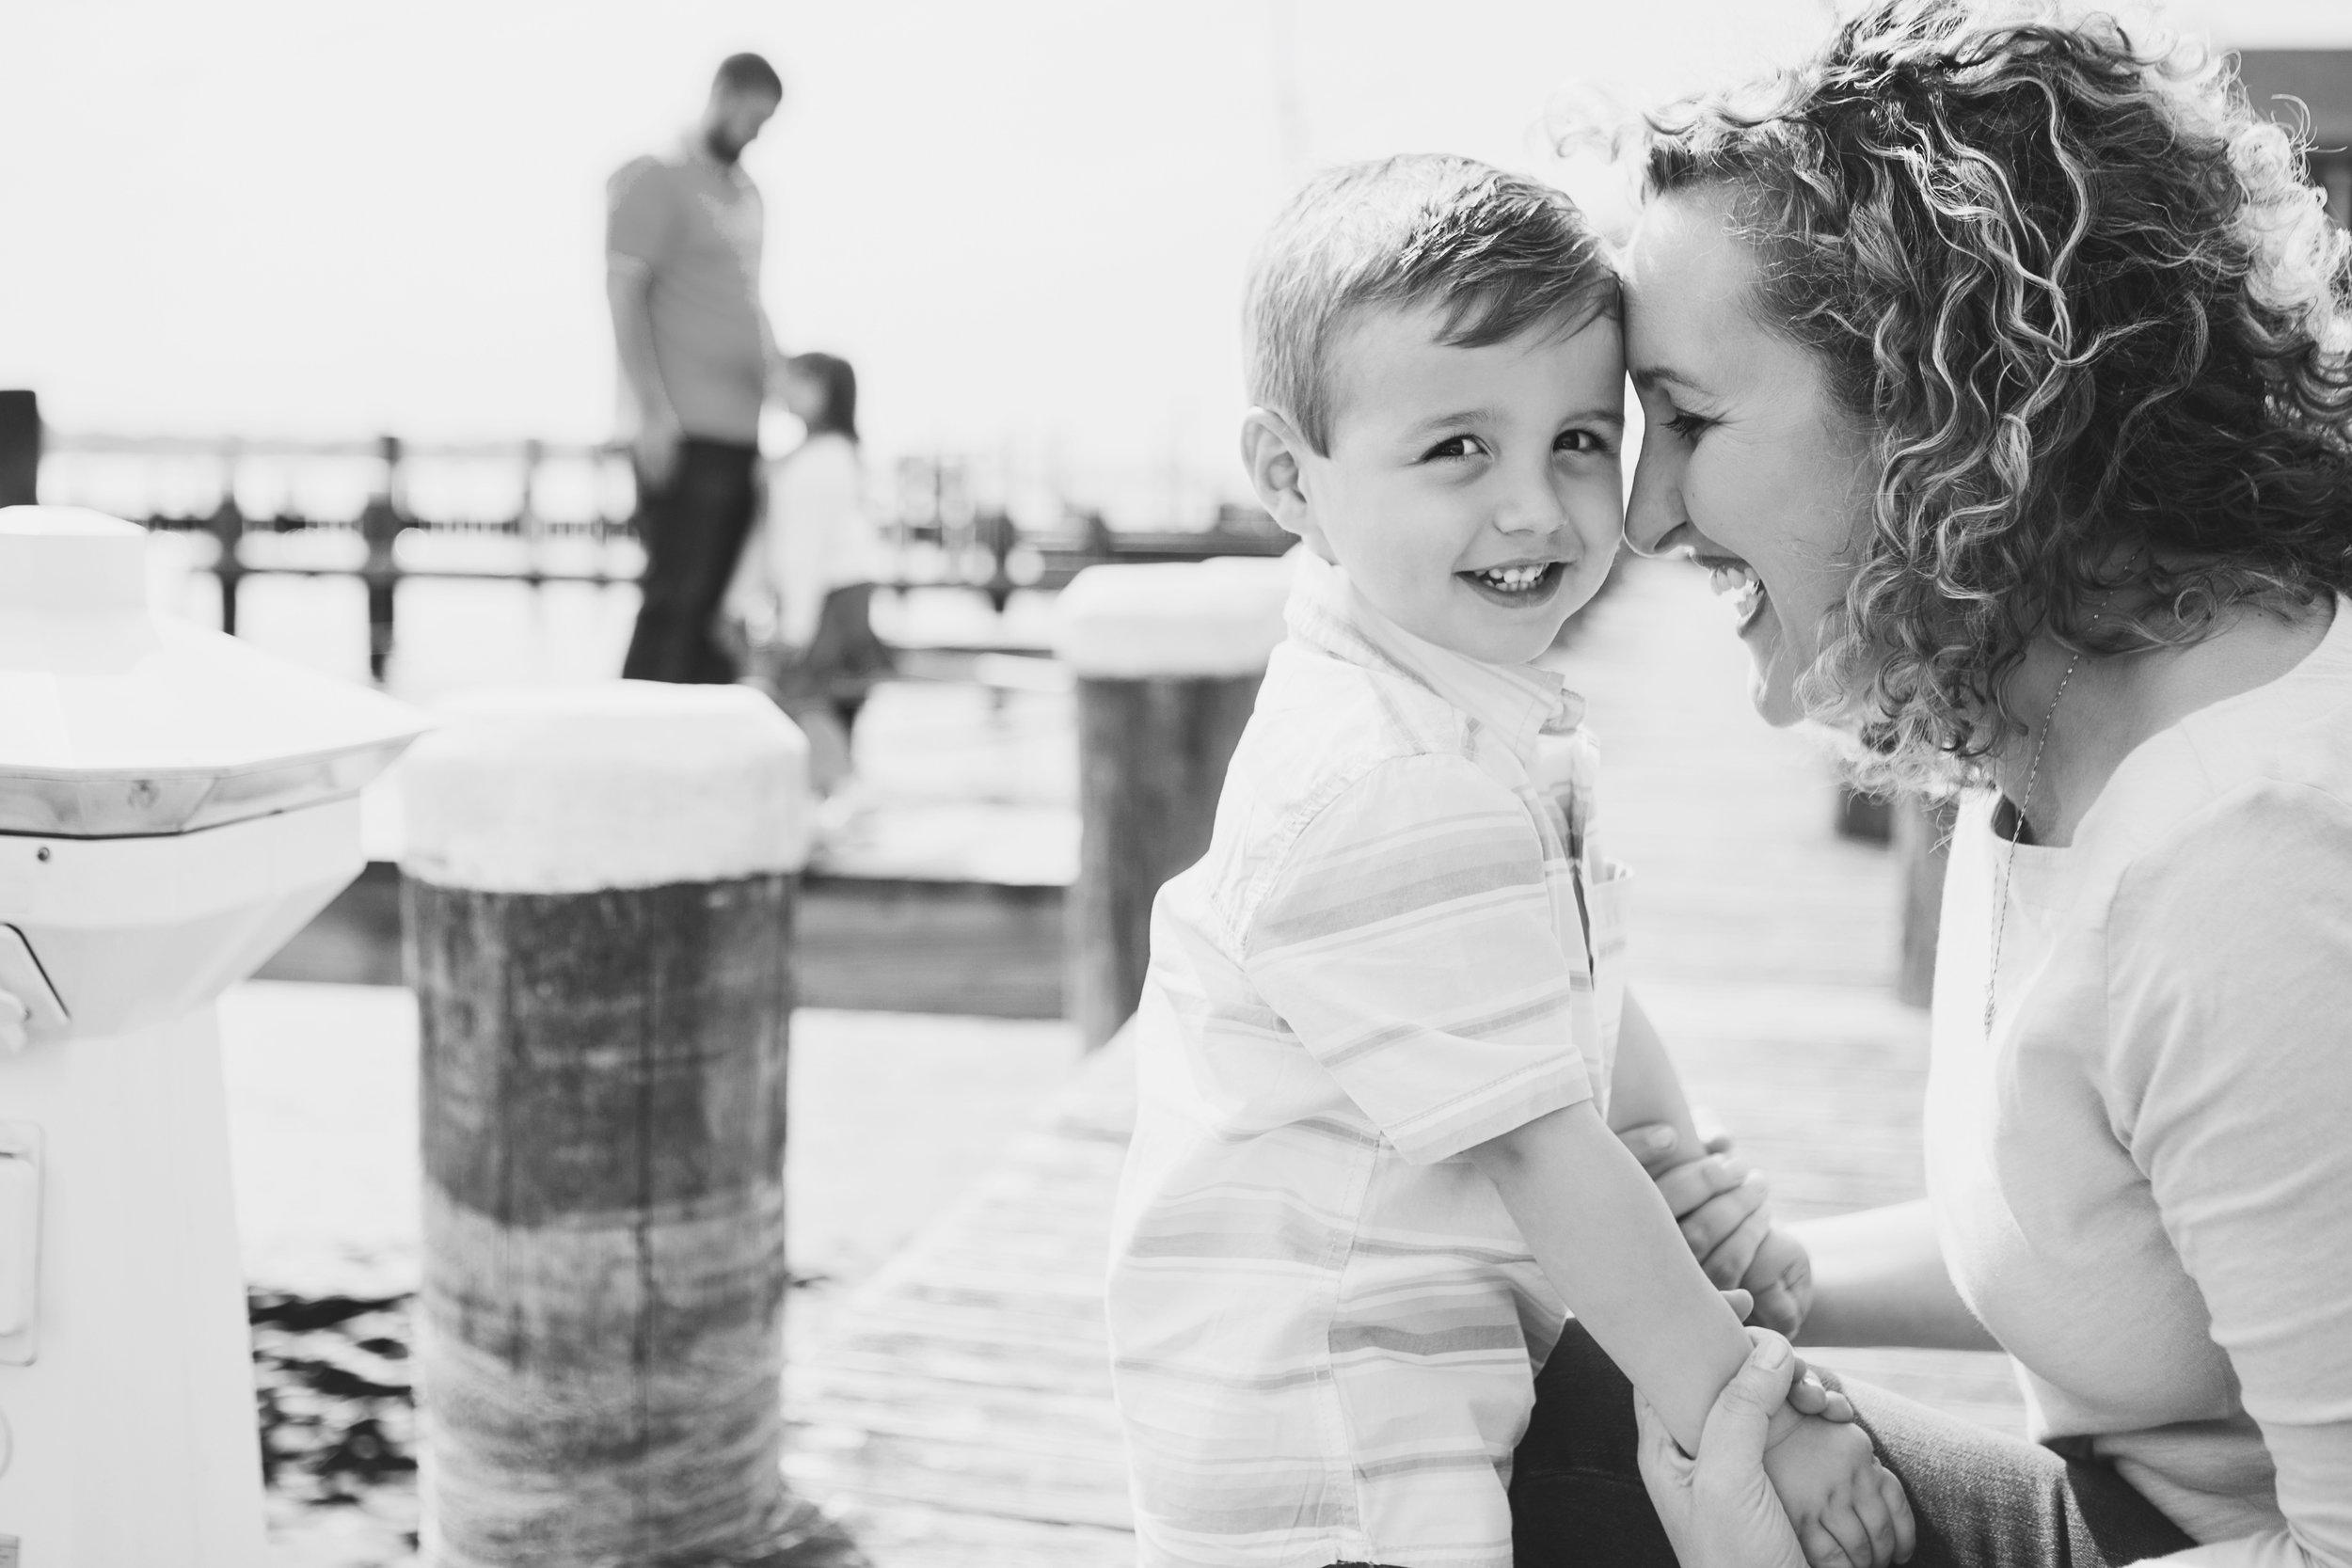 CindyGiovagnoliPhotography_Seattle_Washington_PNW_Family_Childrens_Portraits_Photography-016.jpg